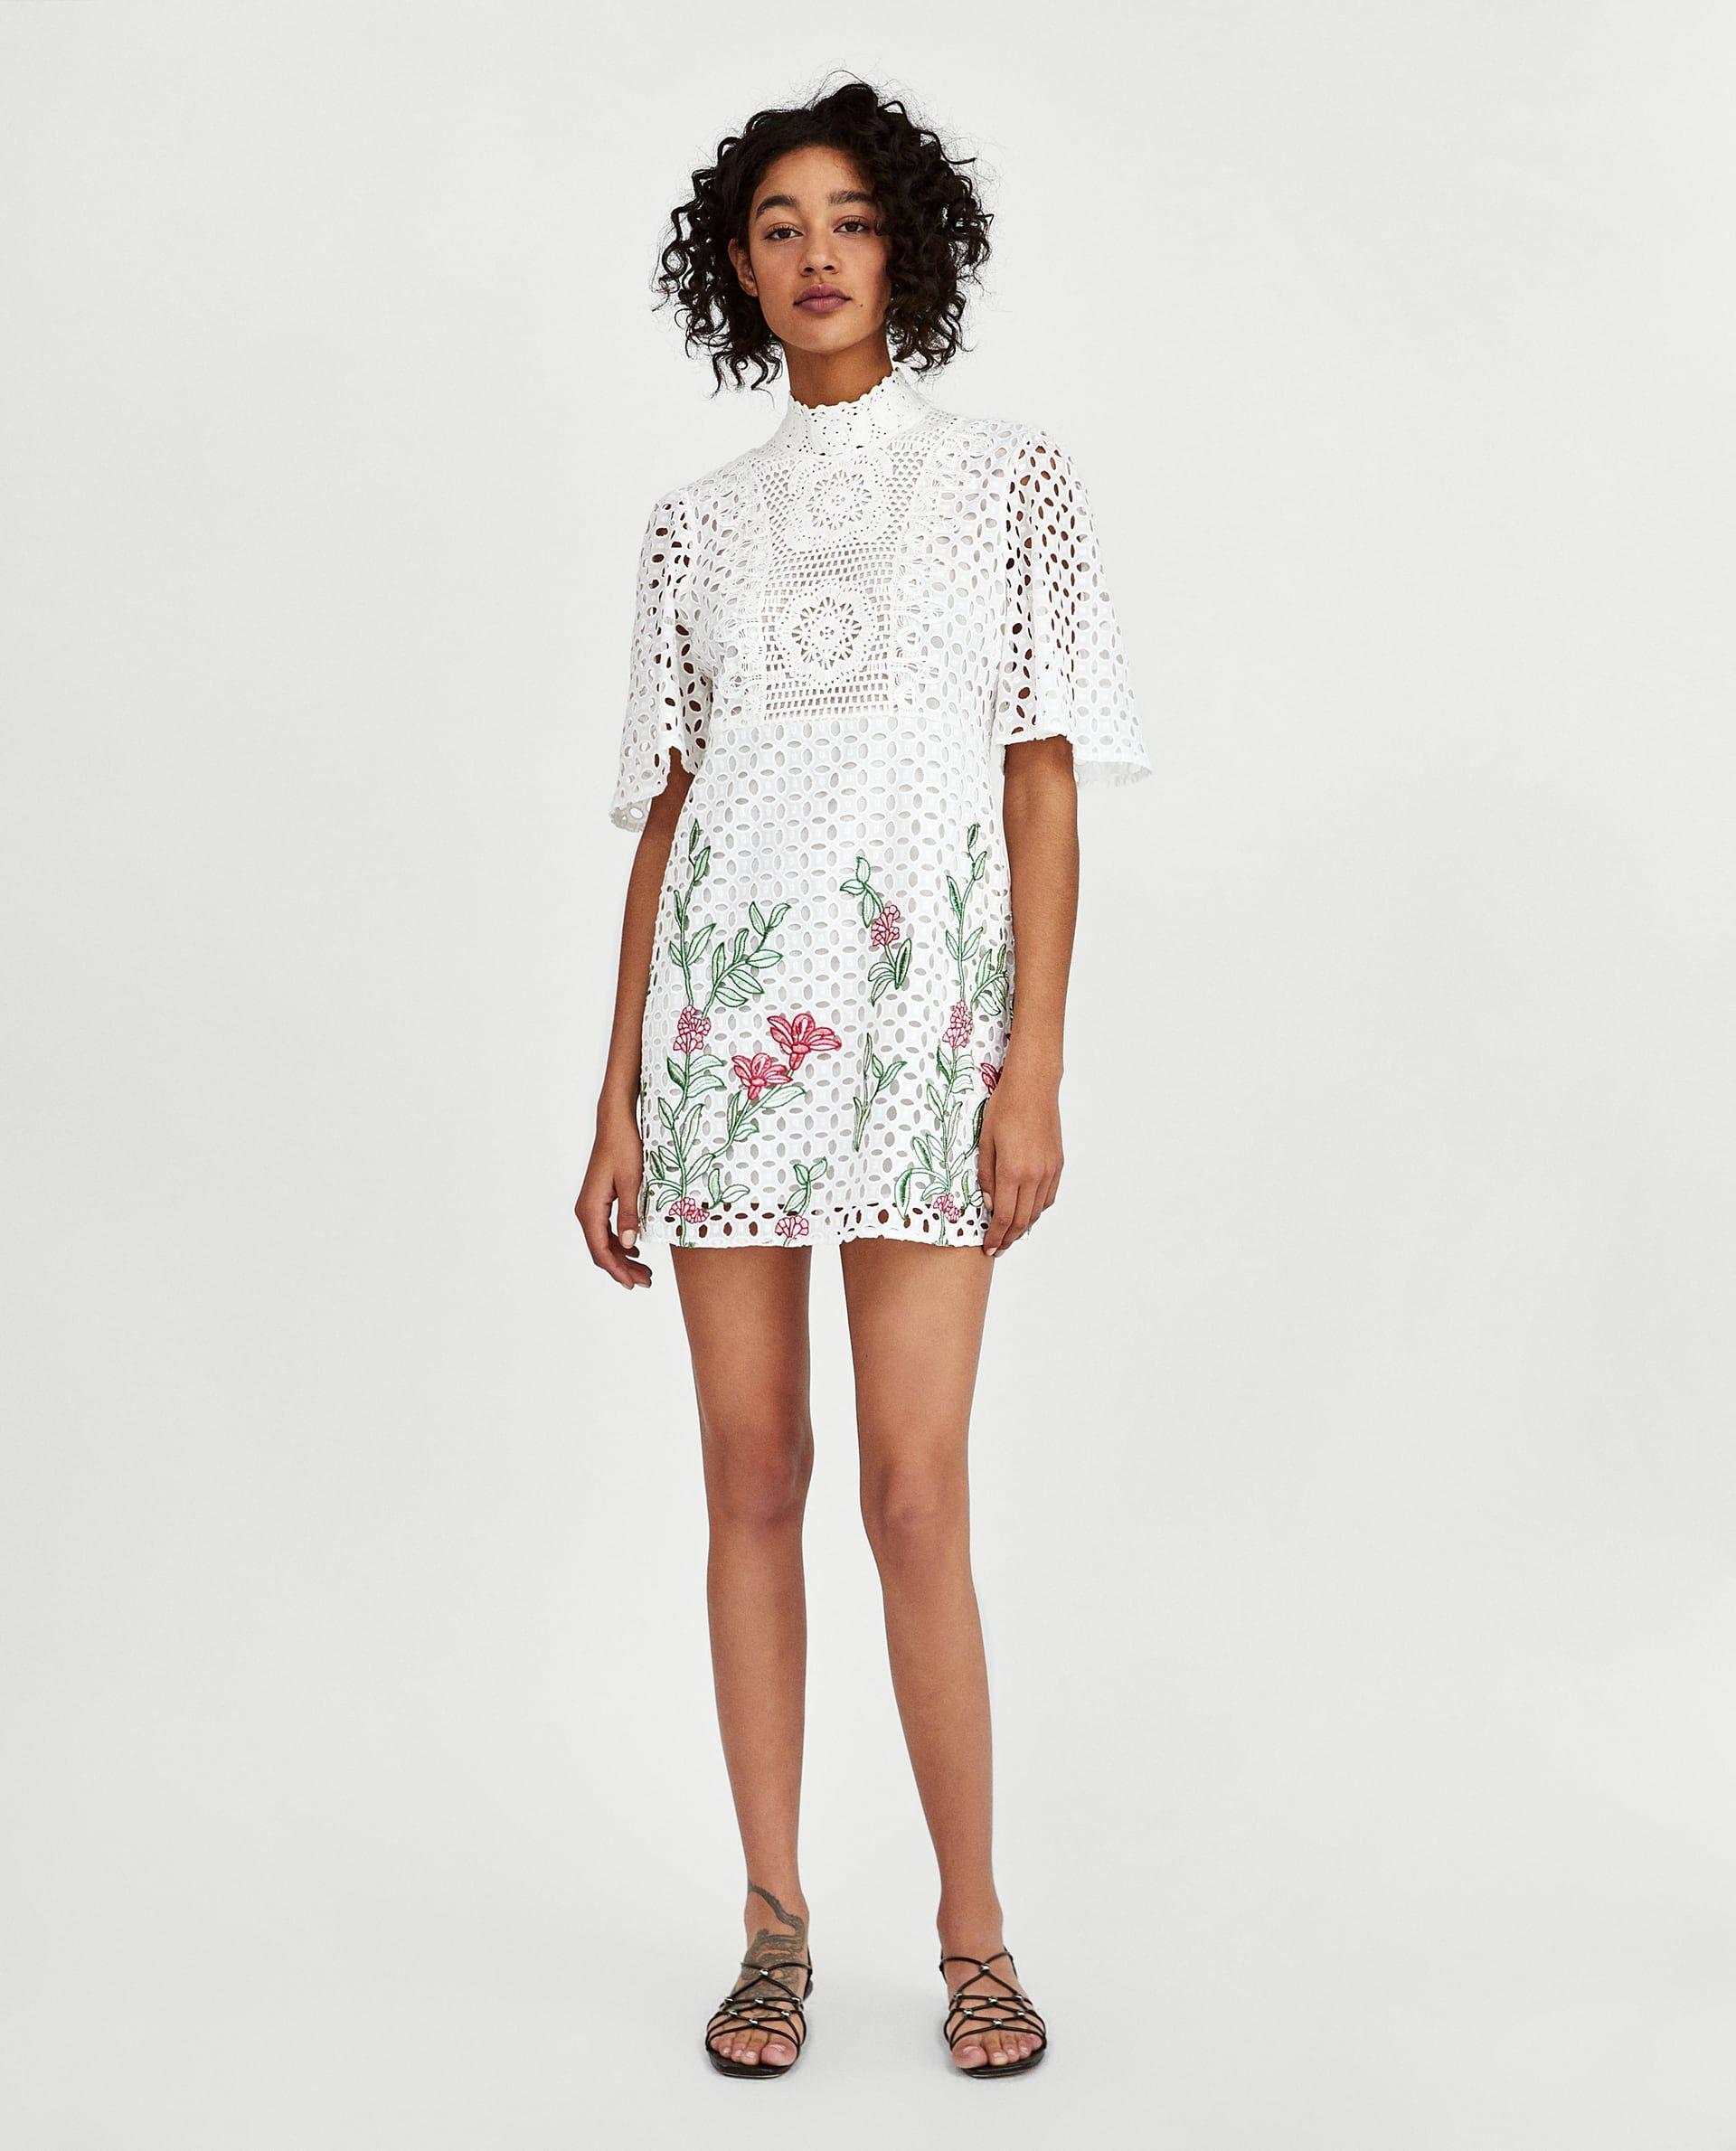 White lace dress zara  VESTIDO BORDADOS ENCAJE  Apparel  Pinterest  Dresses Lace Dress